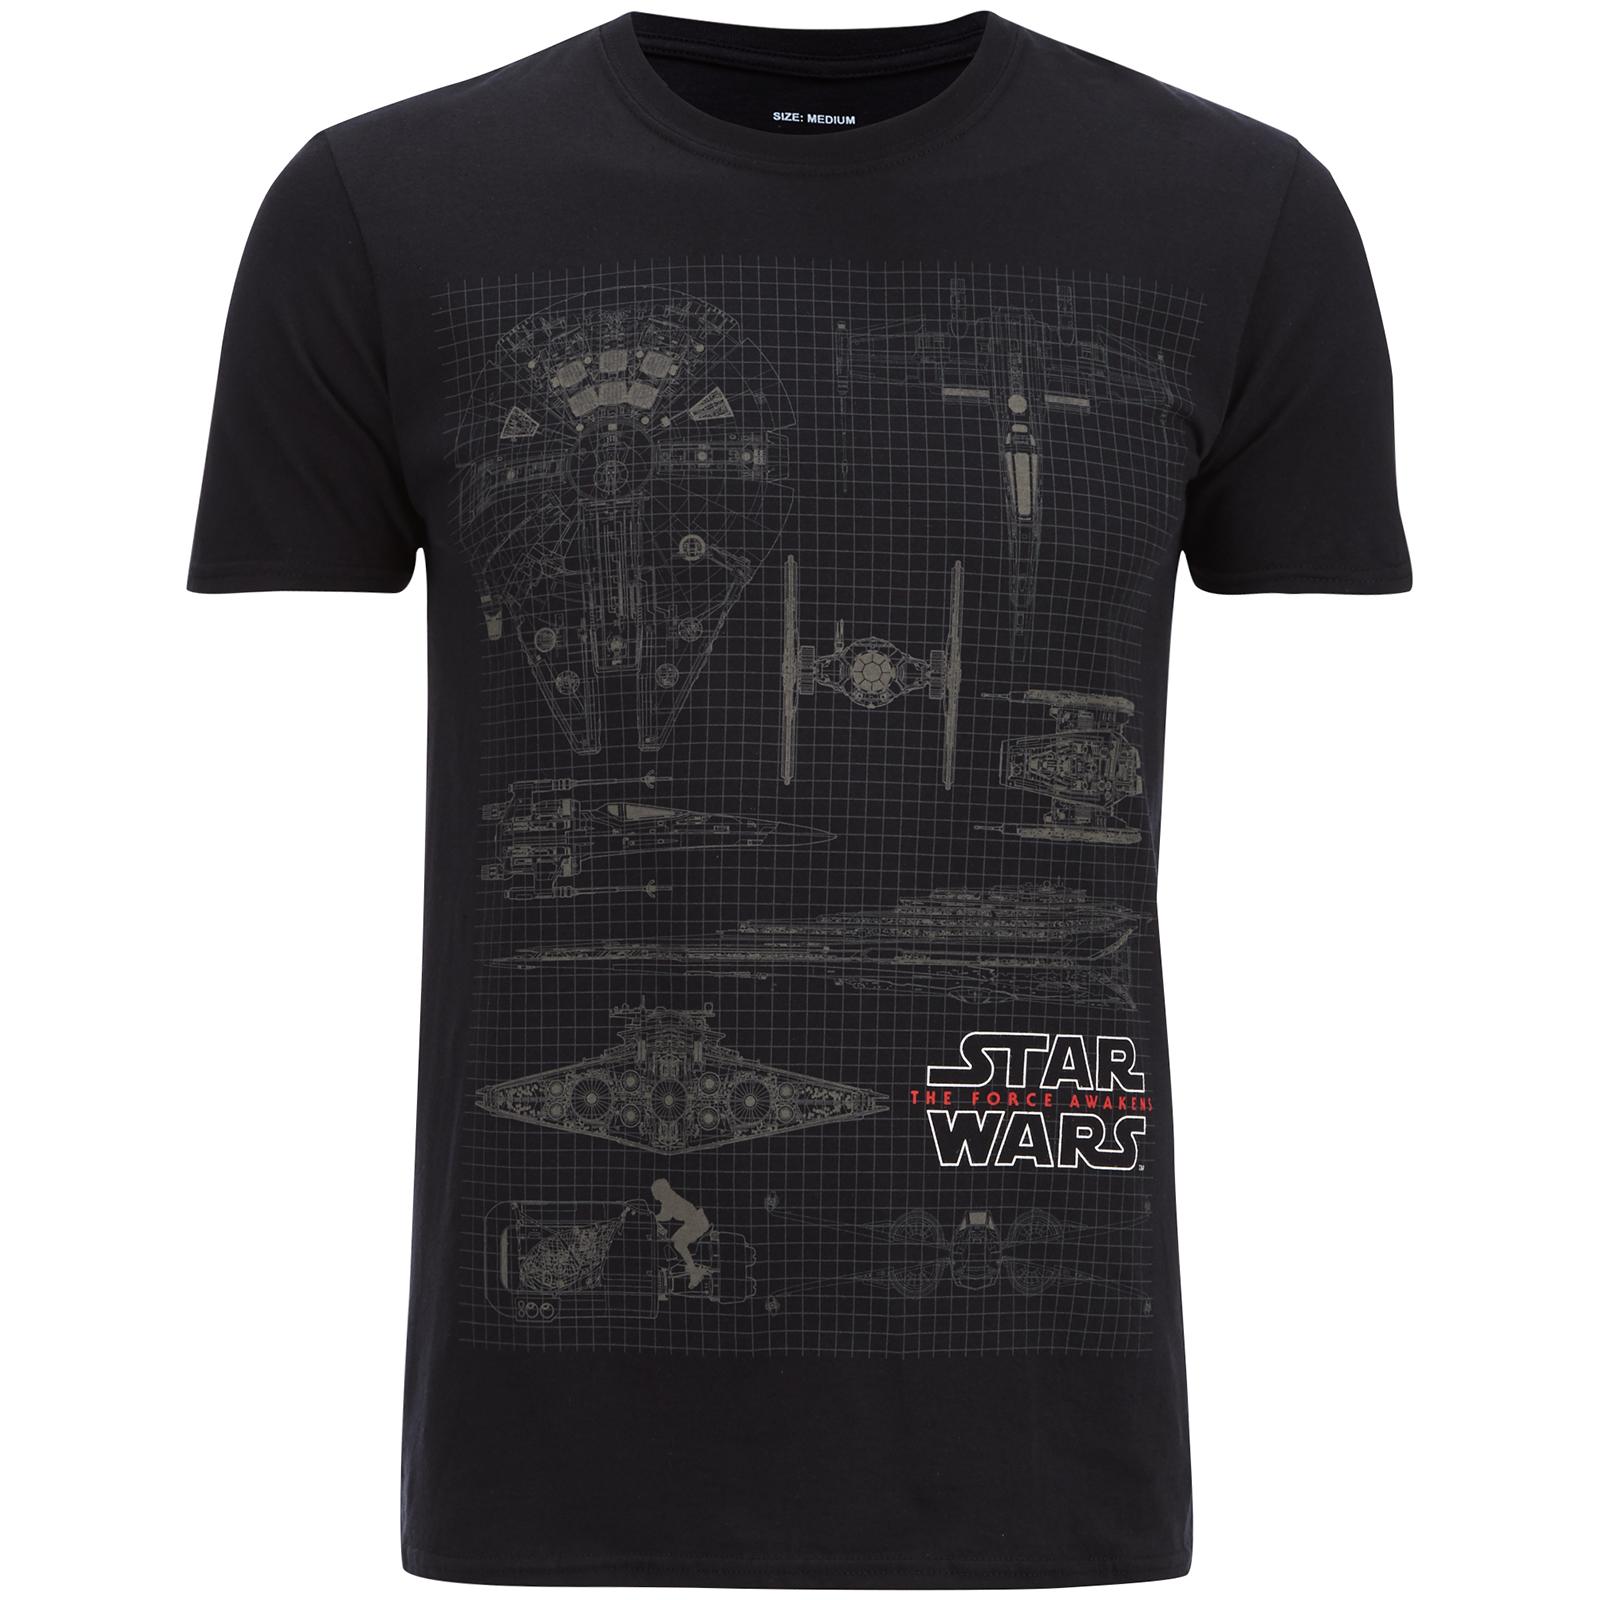 Camiseta Star Wars Diagrama Flota - Hombre - Negro Merchandise ... 7b687ac889a9d